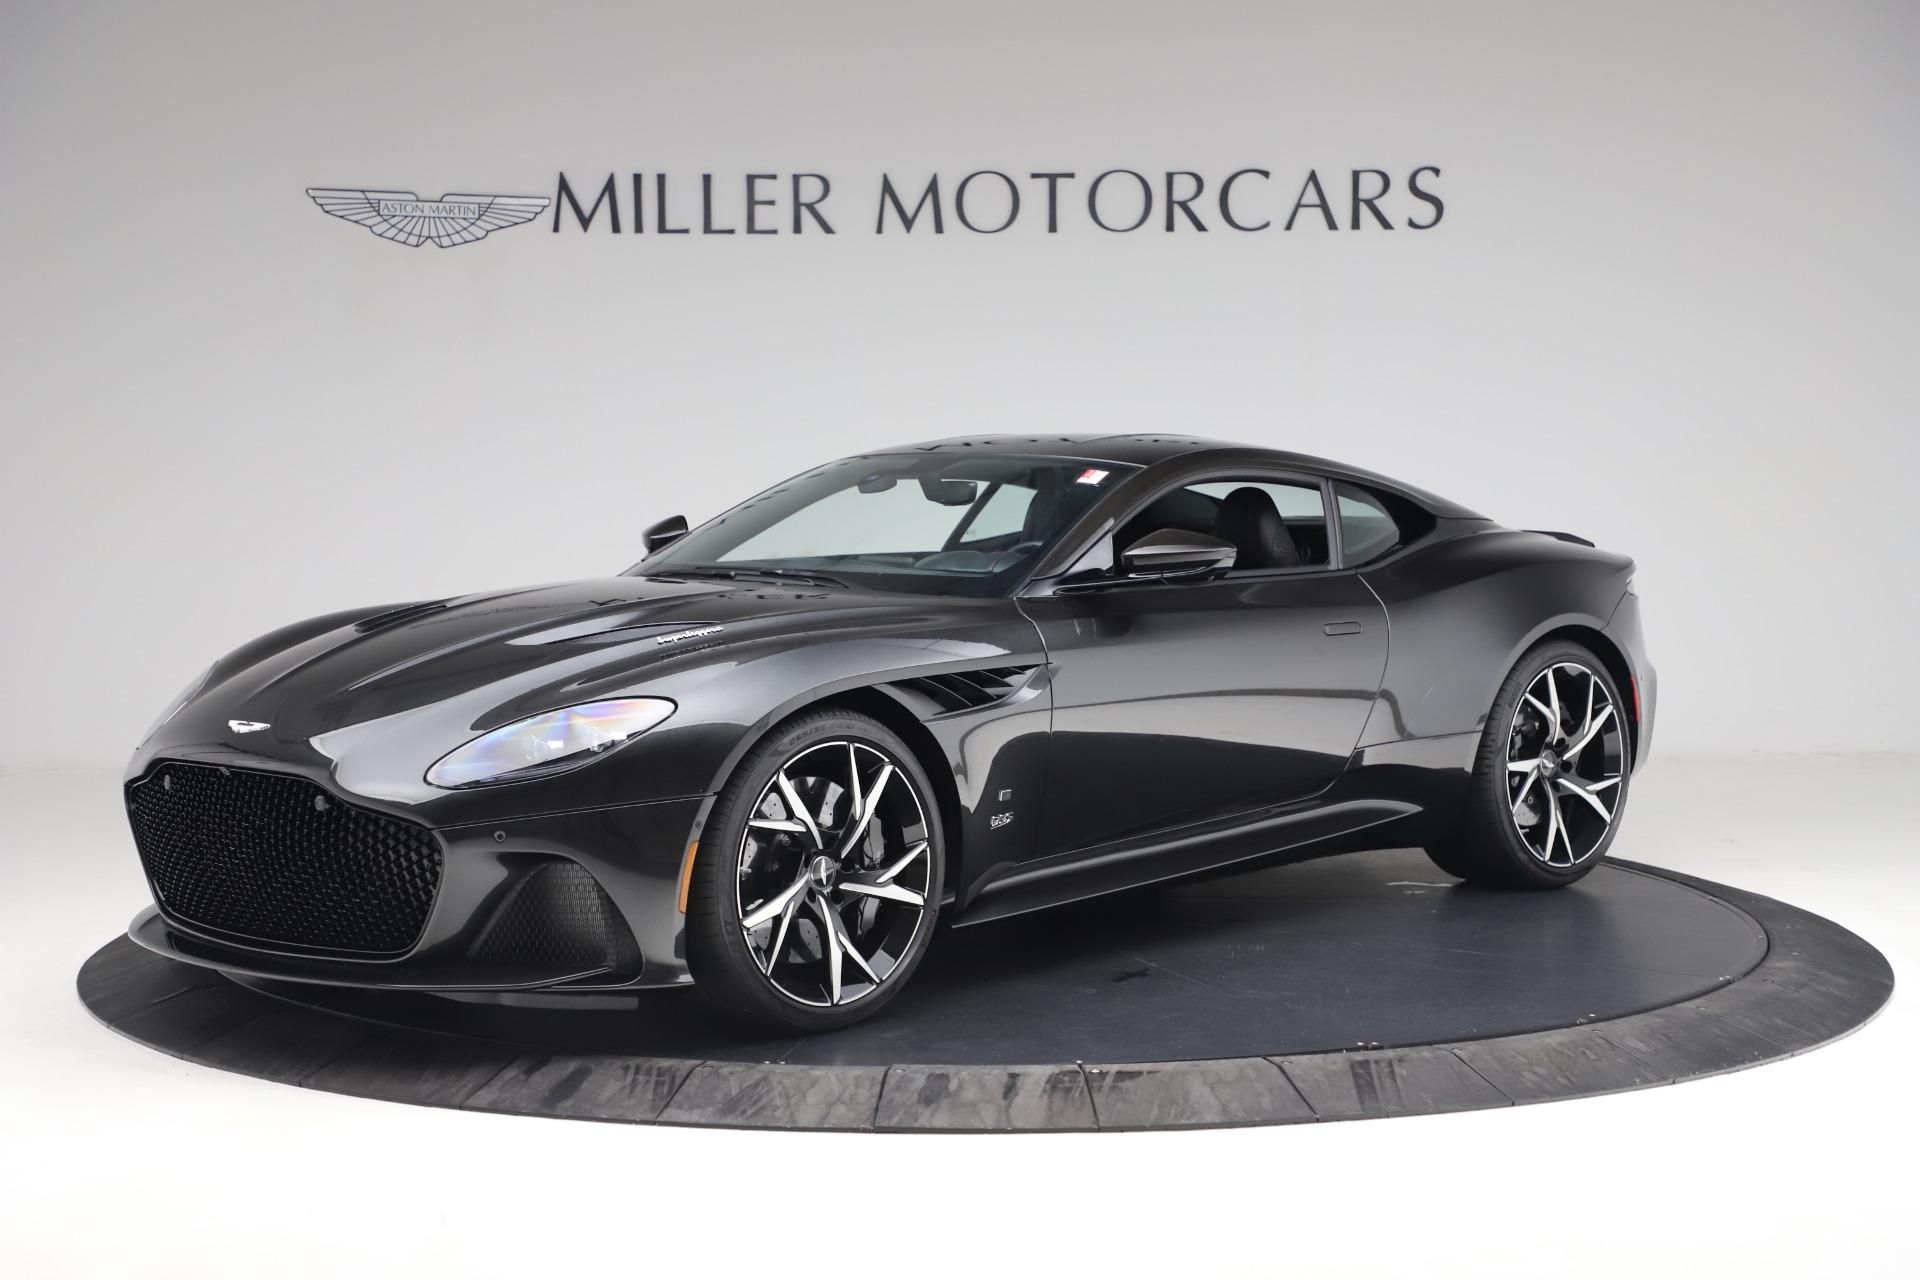 New 2021 Aston Martin DBS Superleggera 007 for sale $391,211 at Rolls-Royce Motor Cars Greenwich in Greenwich CT 06830 1